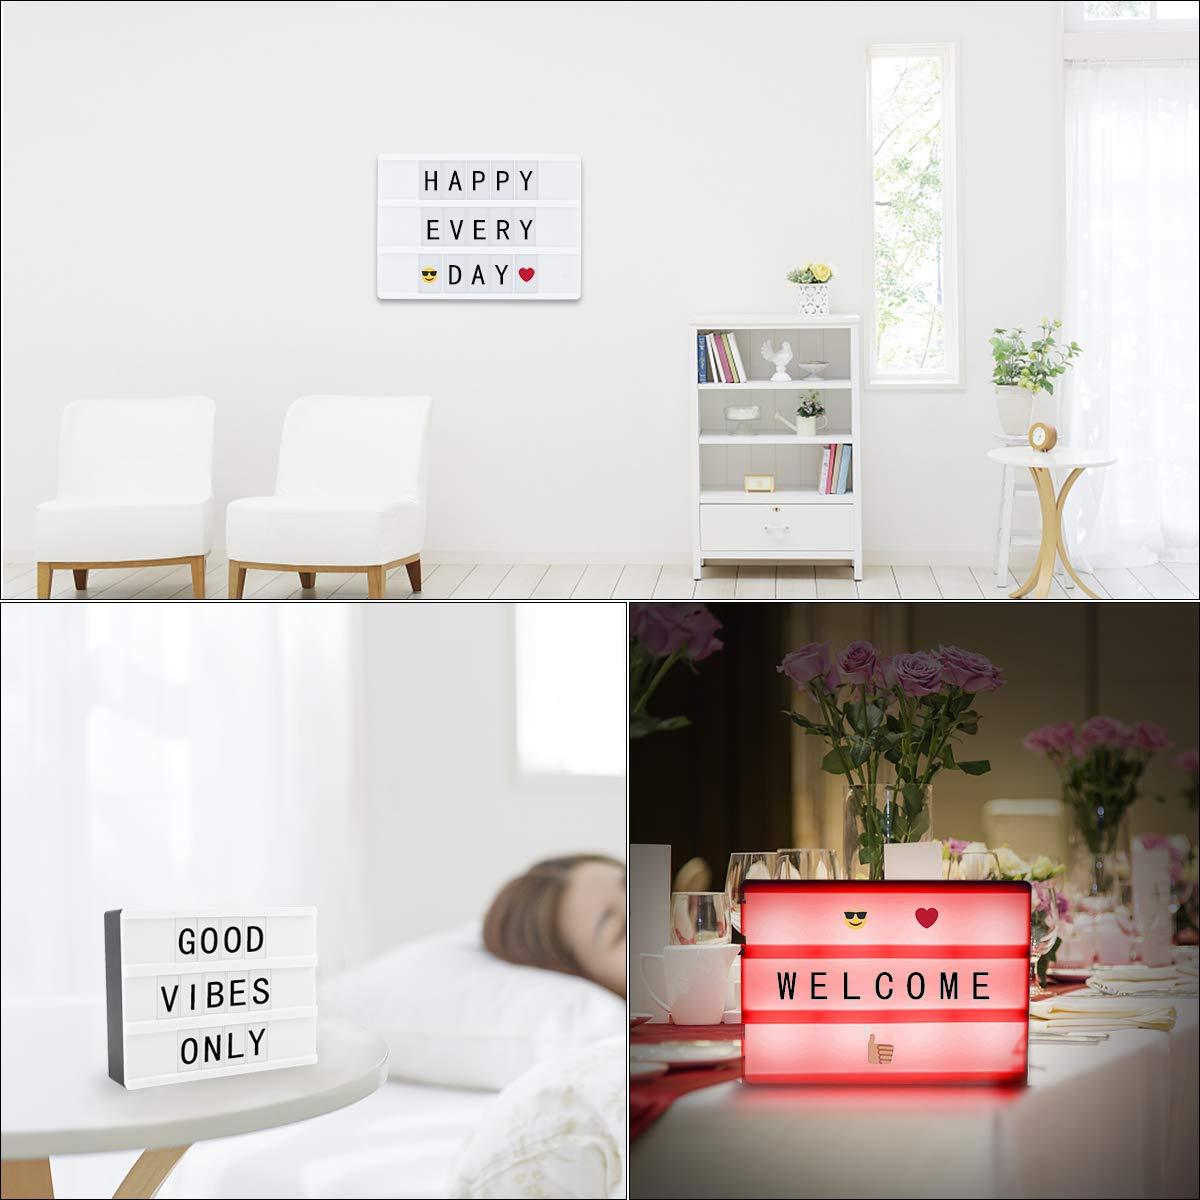 DEALPEAK Cinema Light Box Letters,USB Cable Powered Cinematic LED Light Box 90 Letters